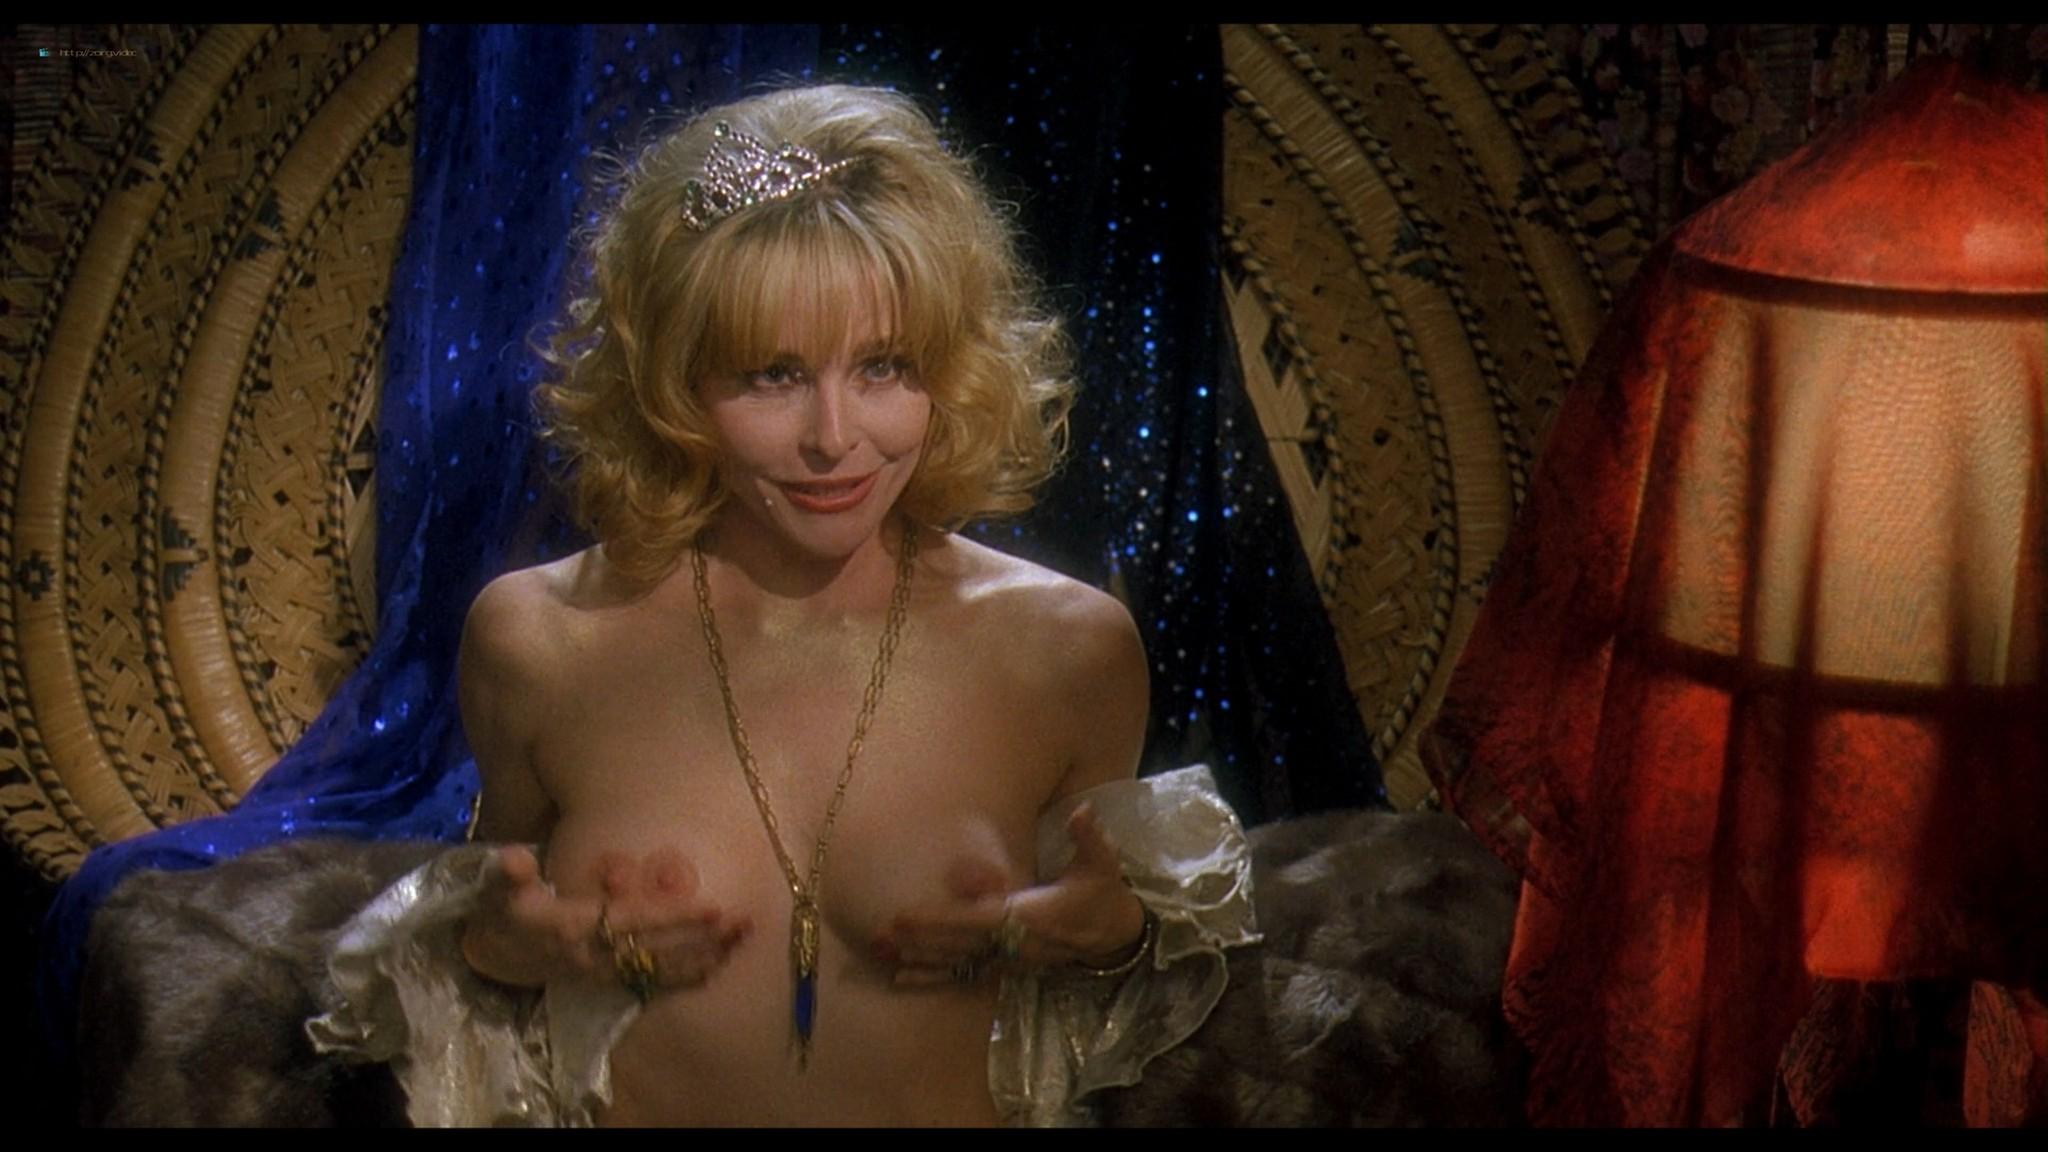 Joey Lauren Adams nude Priscilla Barnes nude topless - Mallrats (1995) HD 1080p BluRay (8)